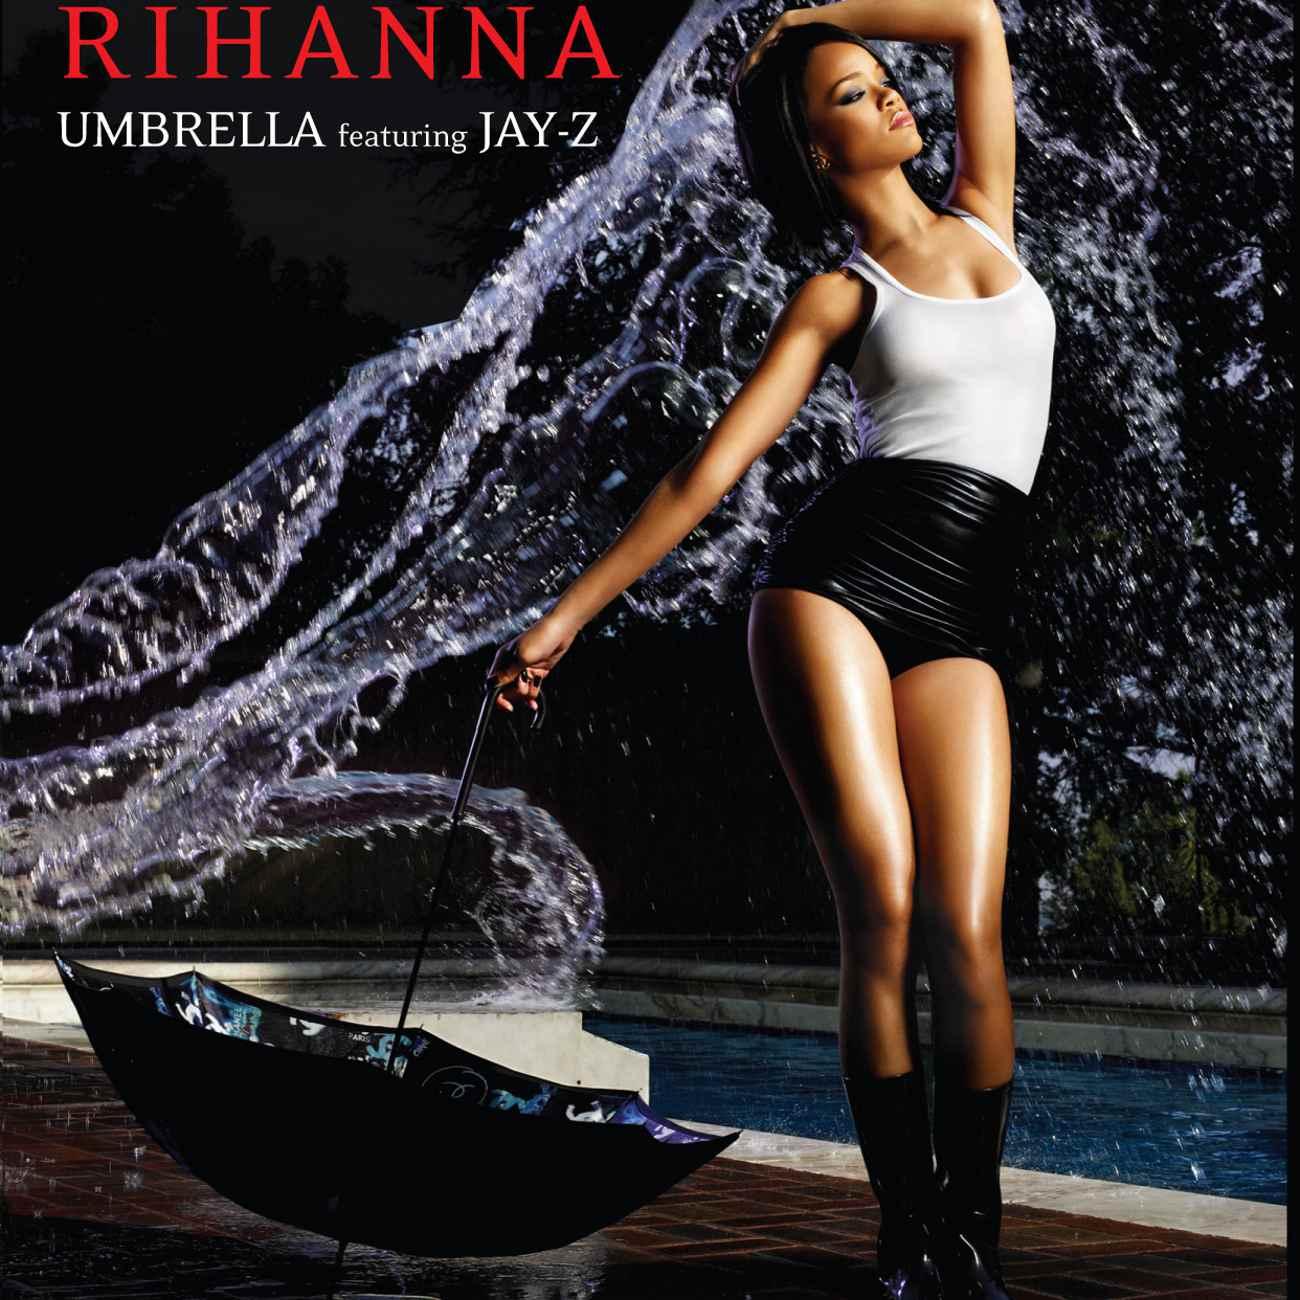 Rihanna - Umbrella featuring Jay-Z